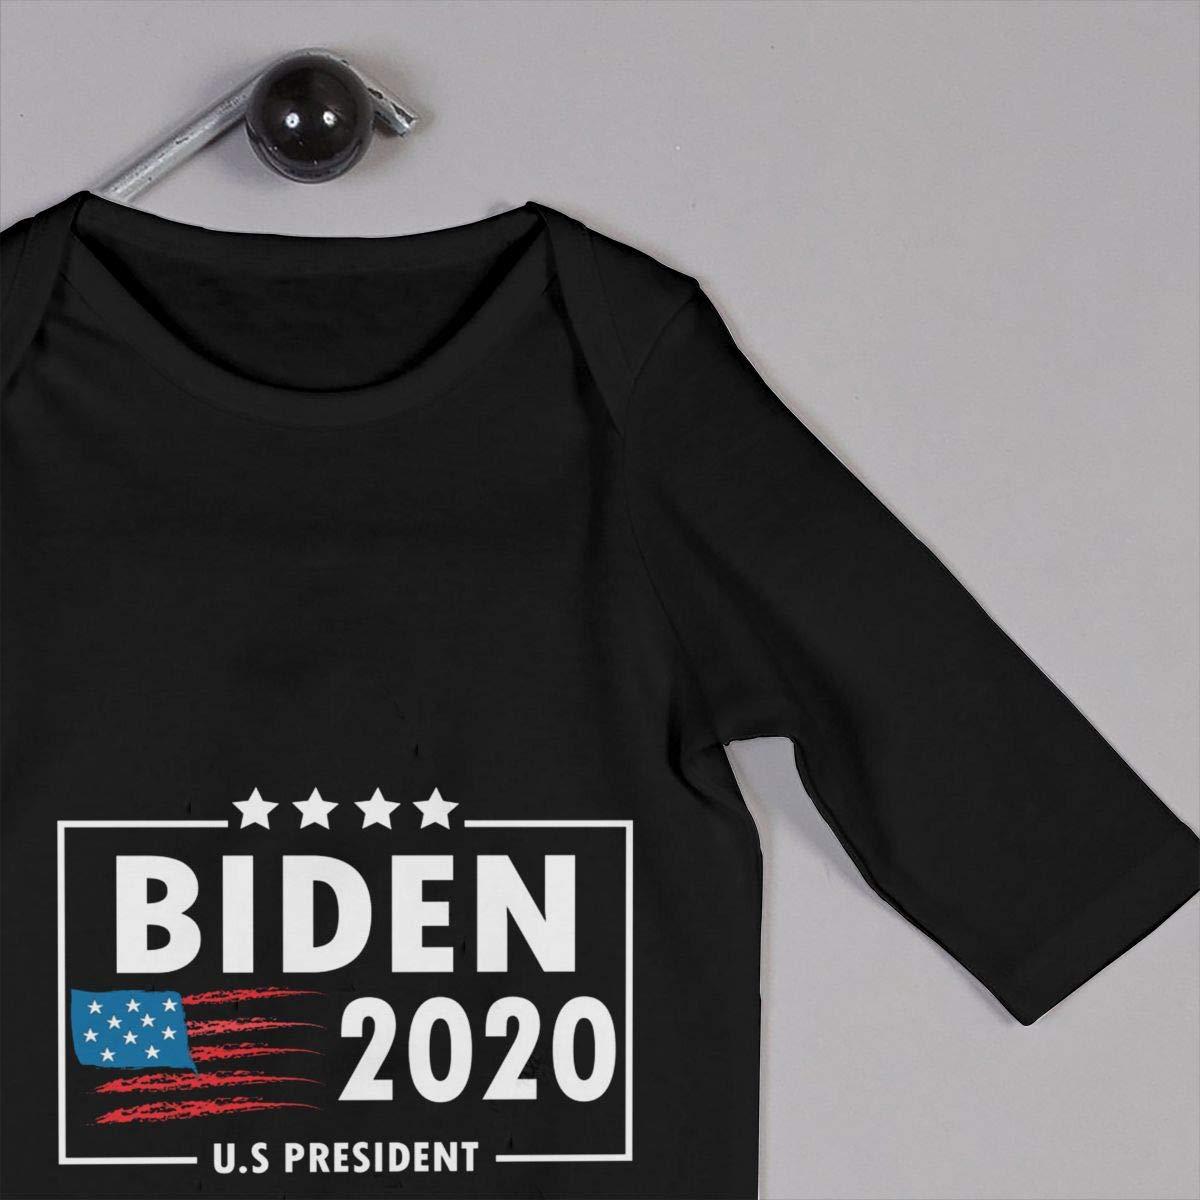 Joe Biden for President 2020 Newborn Baby Long Sleeve Bodysuits Rompers Outfits